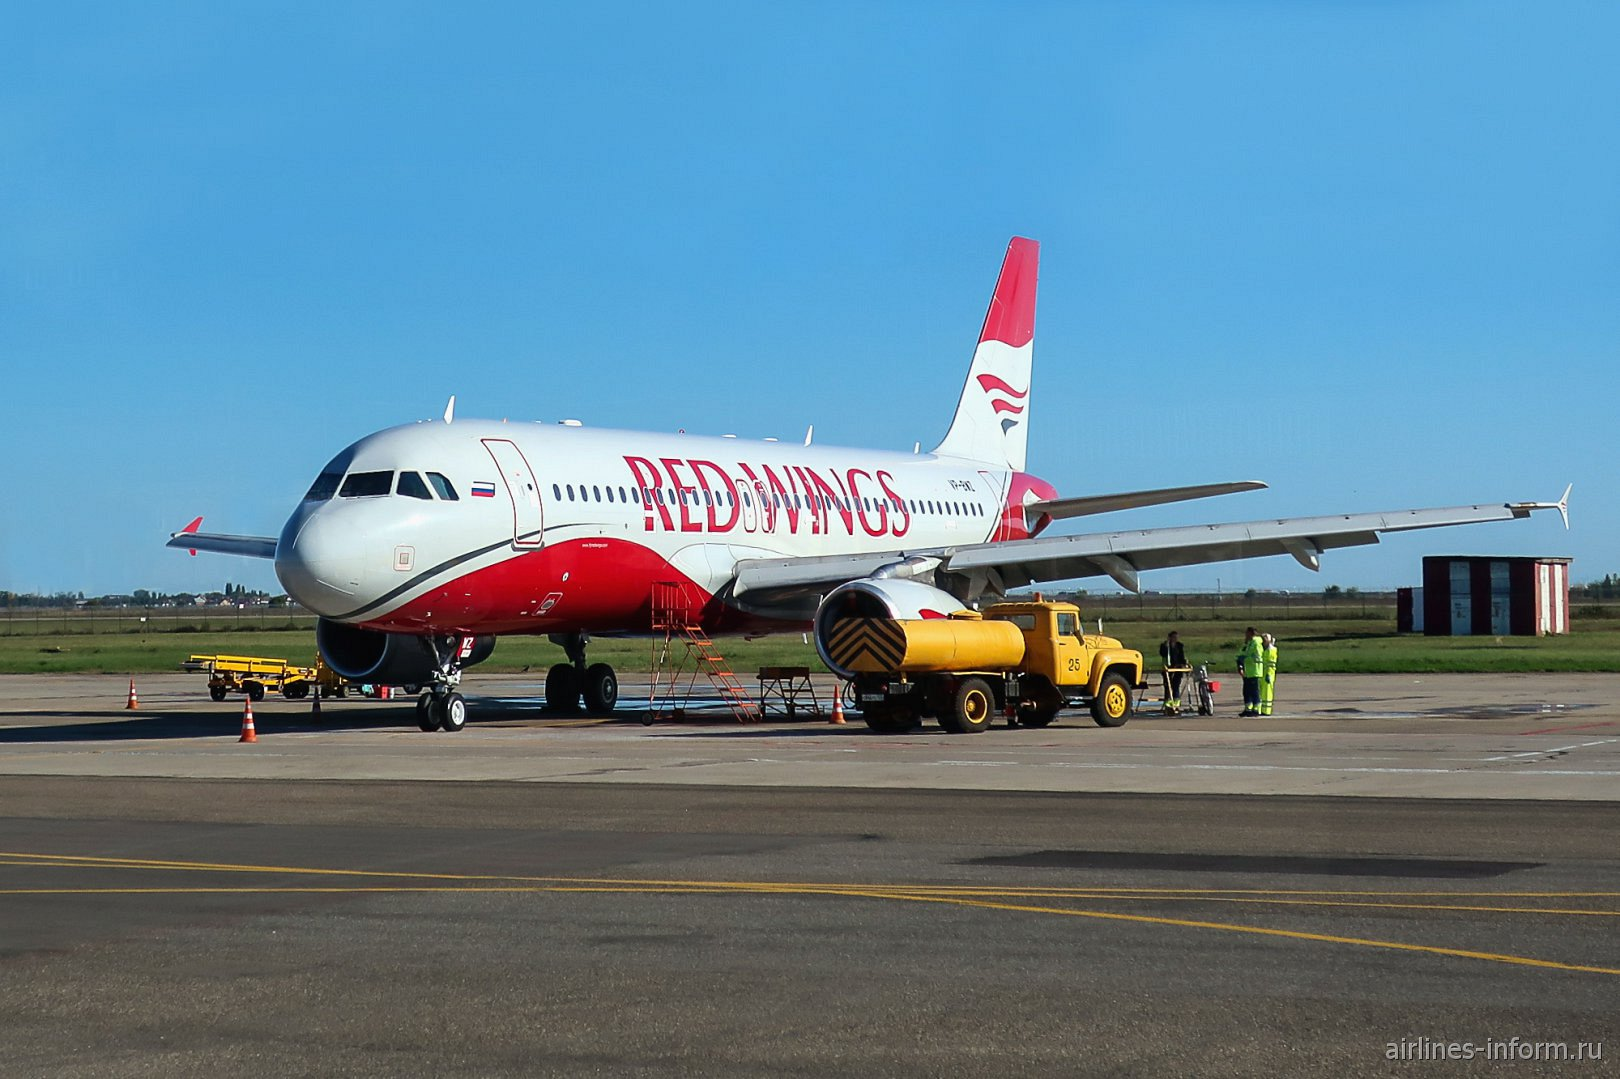 Самолет Airbus A320 авиакомпании Red Wings в аэропорту Краснодара